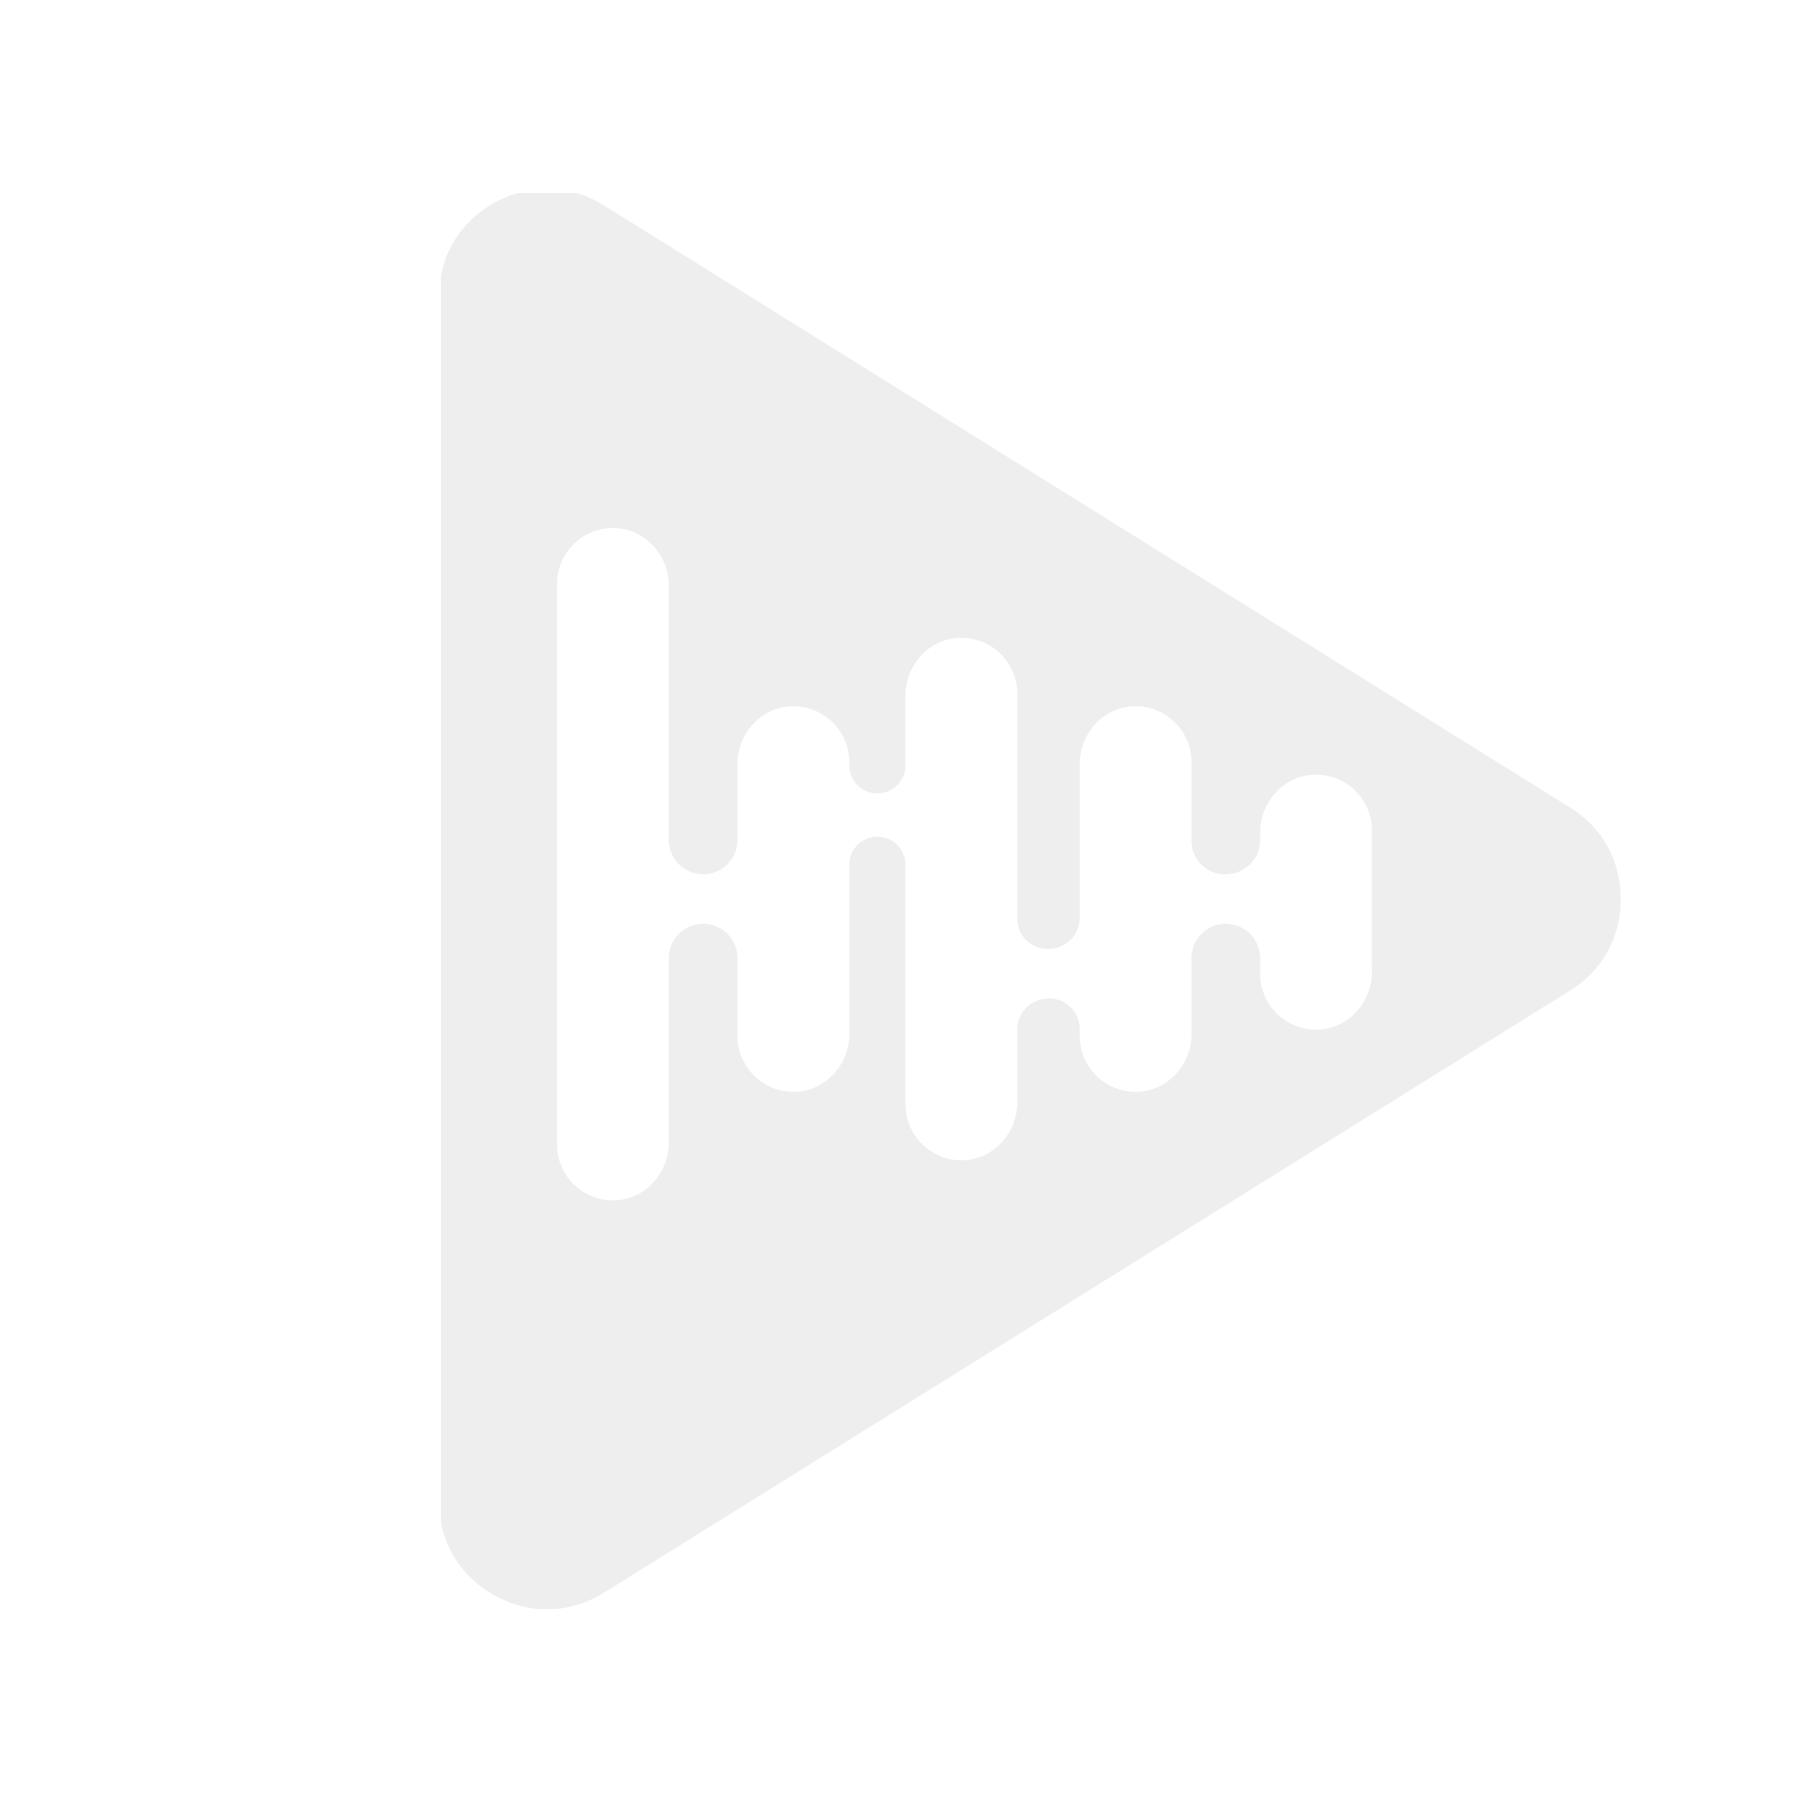 Kufatec Fistune 40148-1